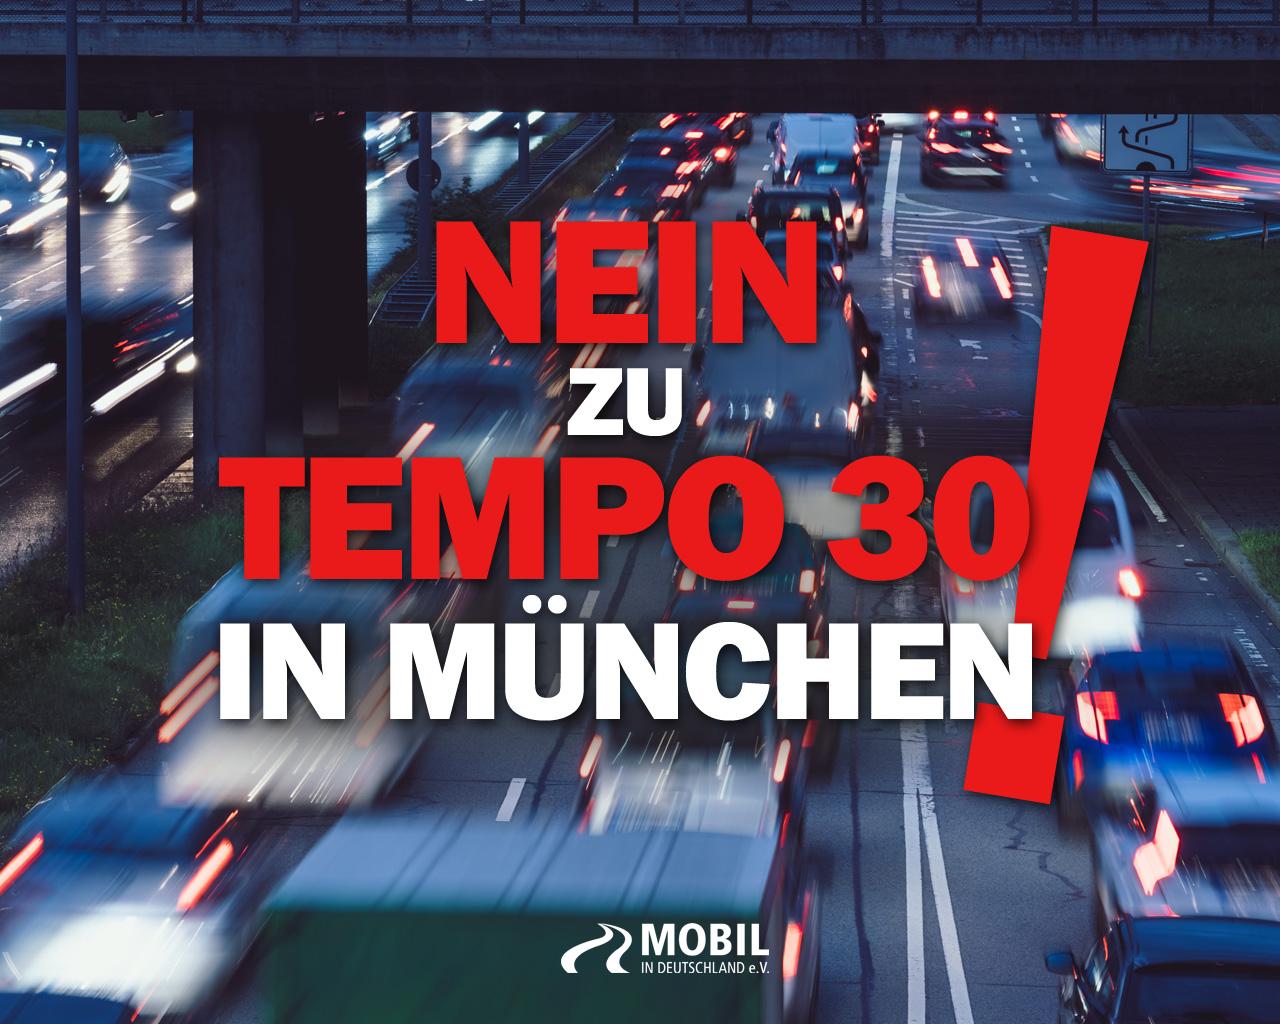 Nein zu Tempo 30 in München!